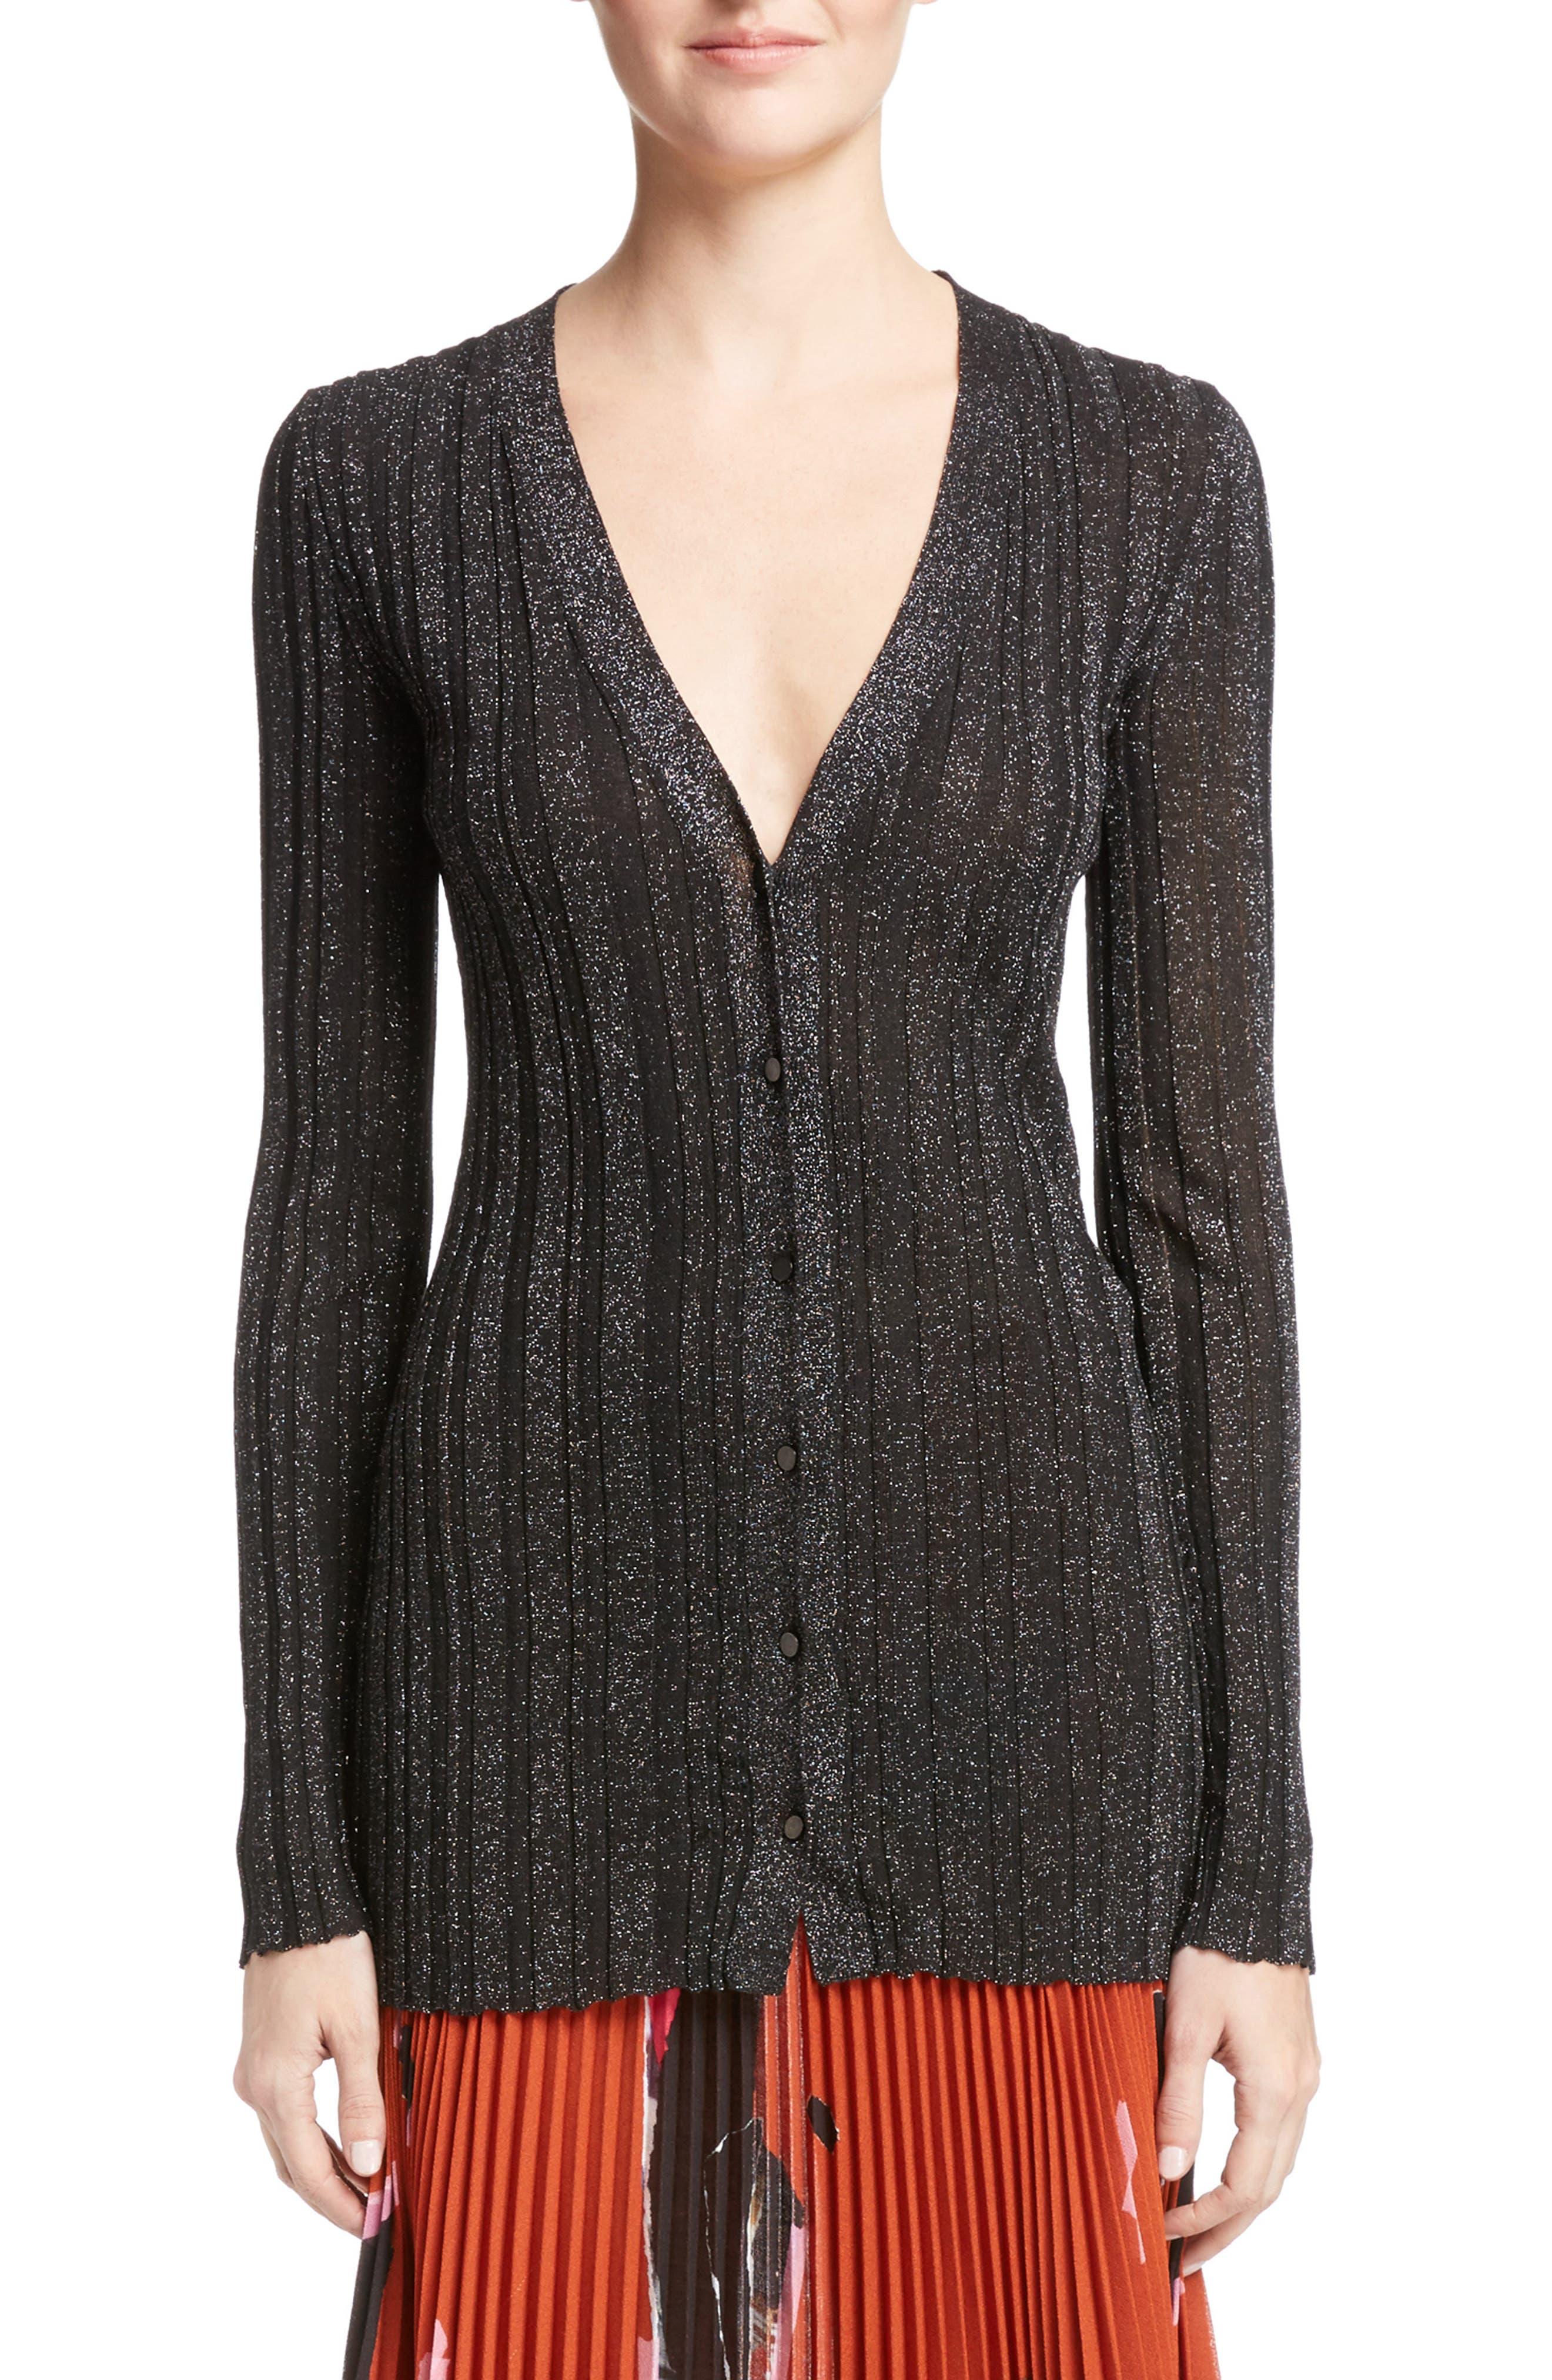 Proenza Schouler Lurex® Metallic Rib Knit Cardigan